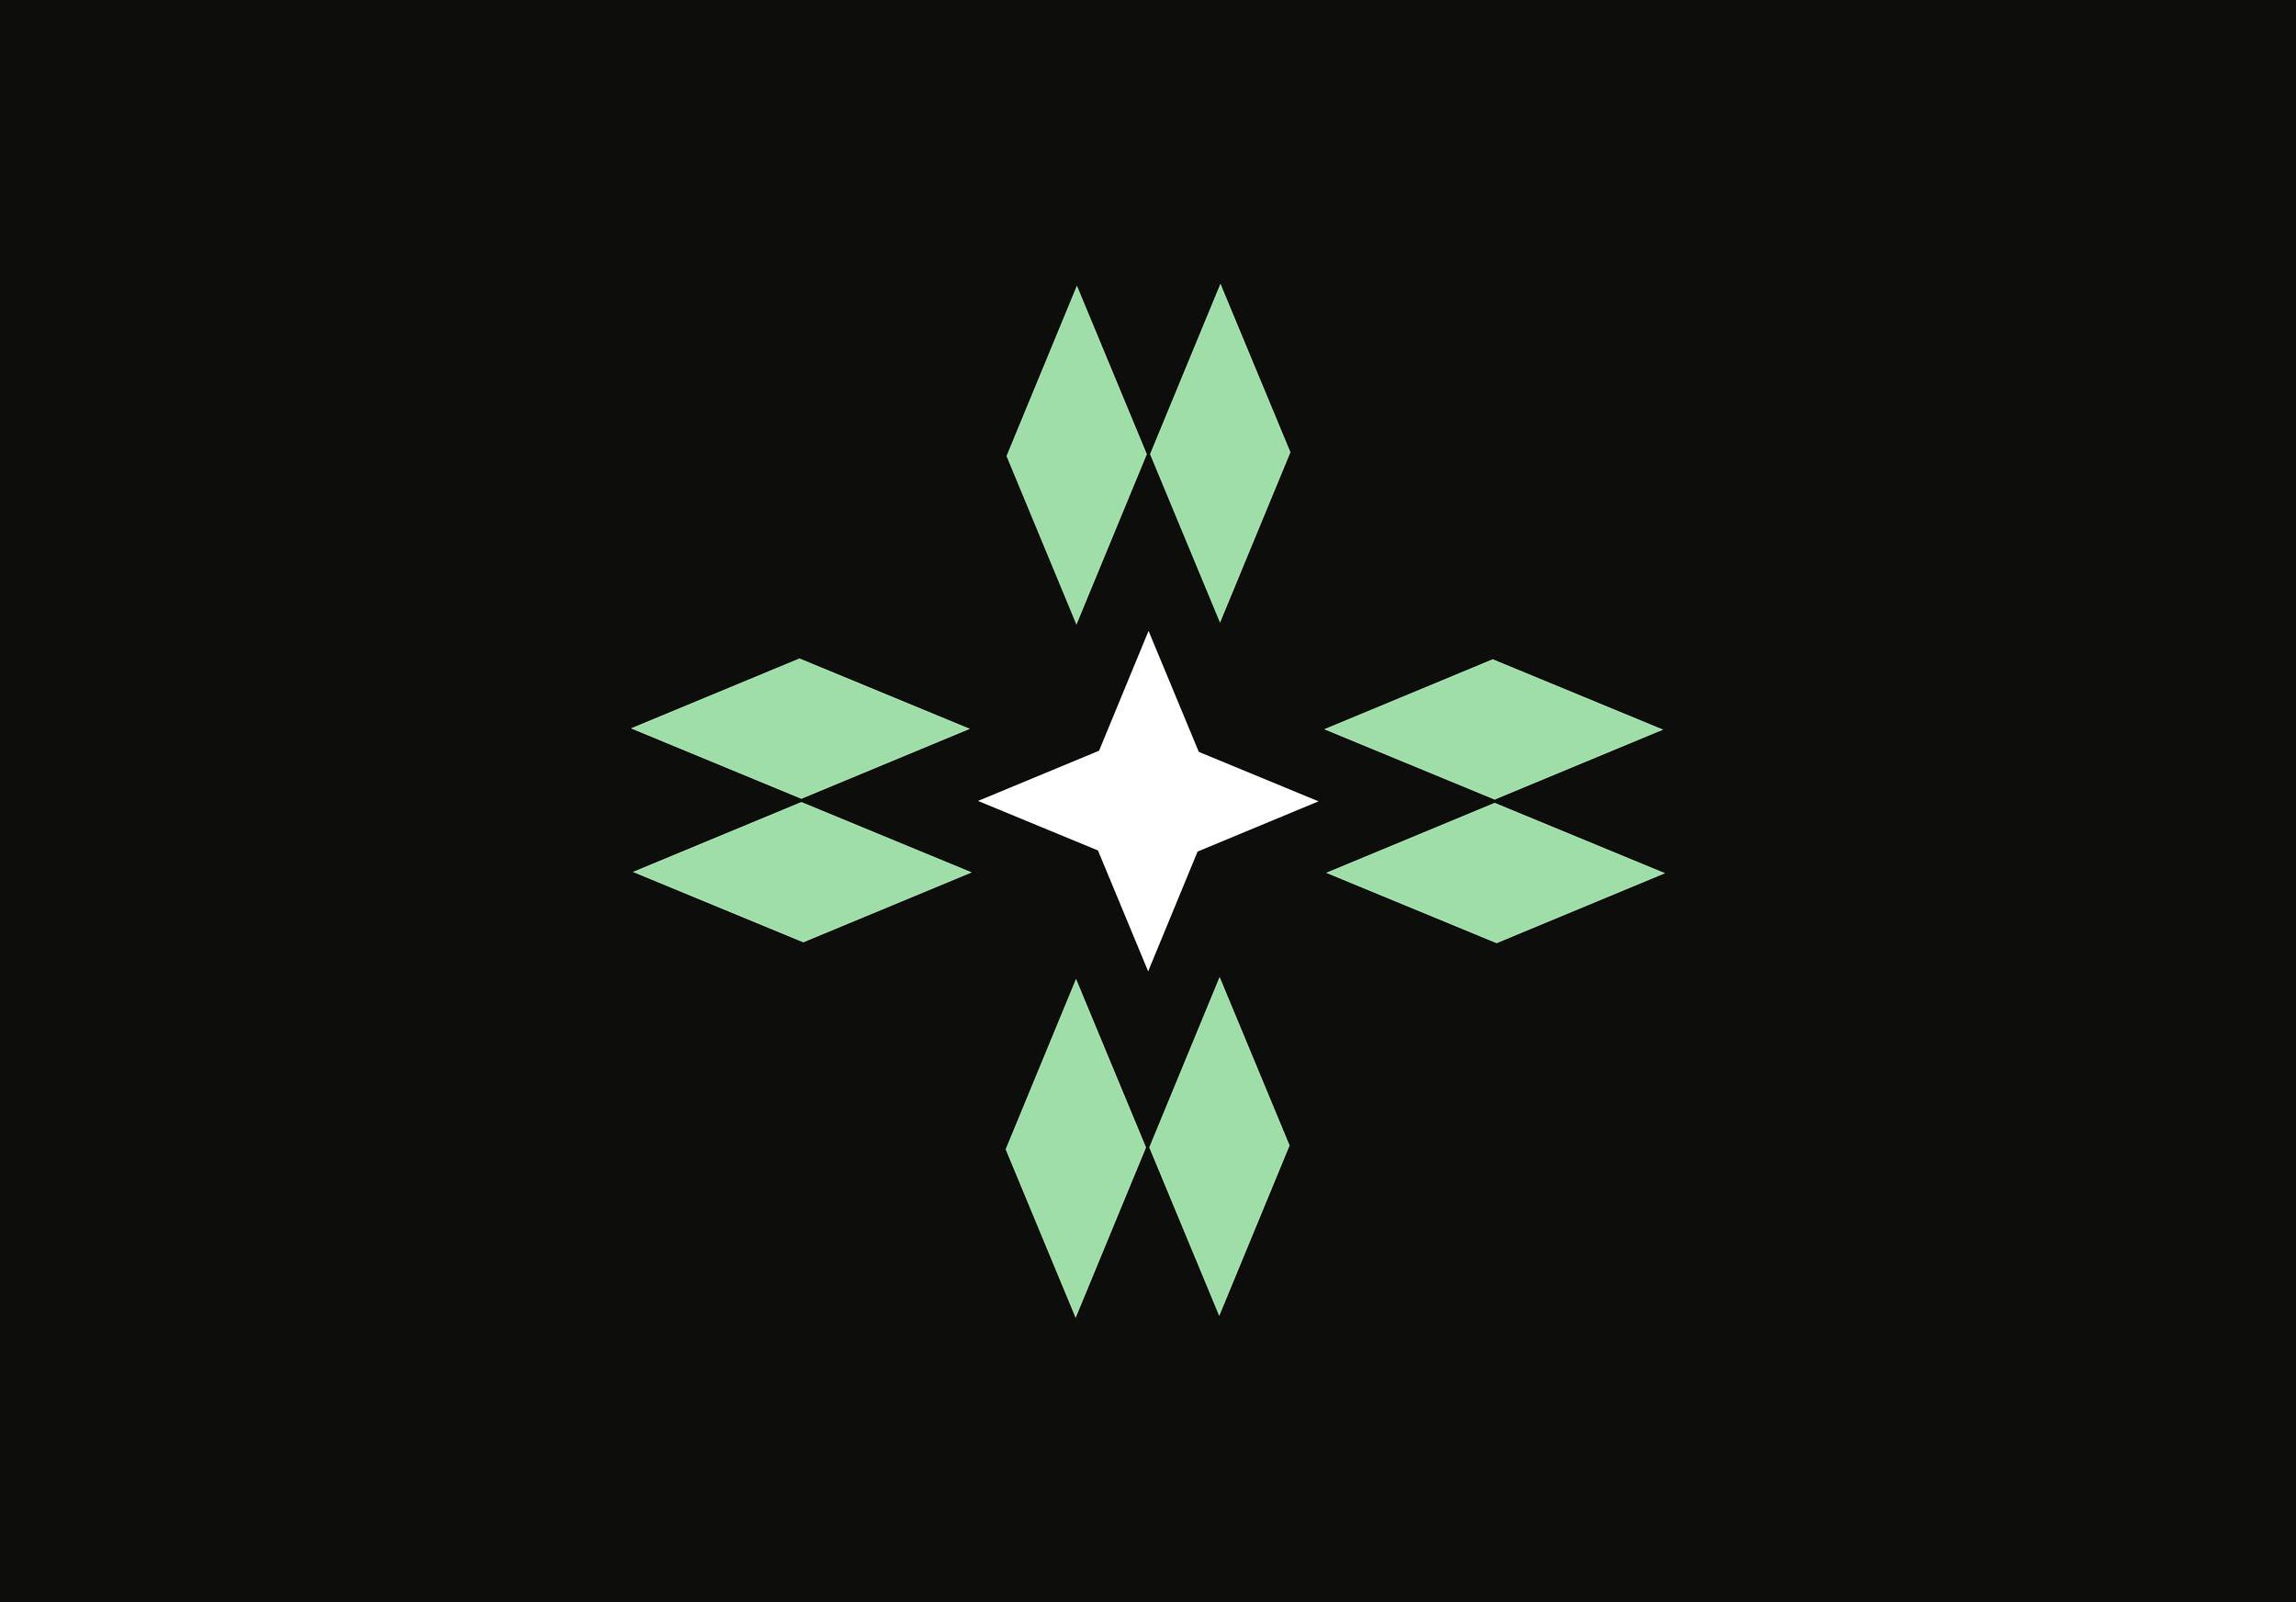 NorthStar_DiamondStar_Logo_Mark_(Wh_Color).jpg